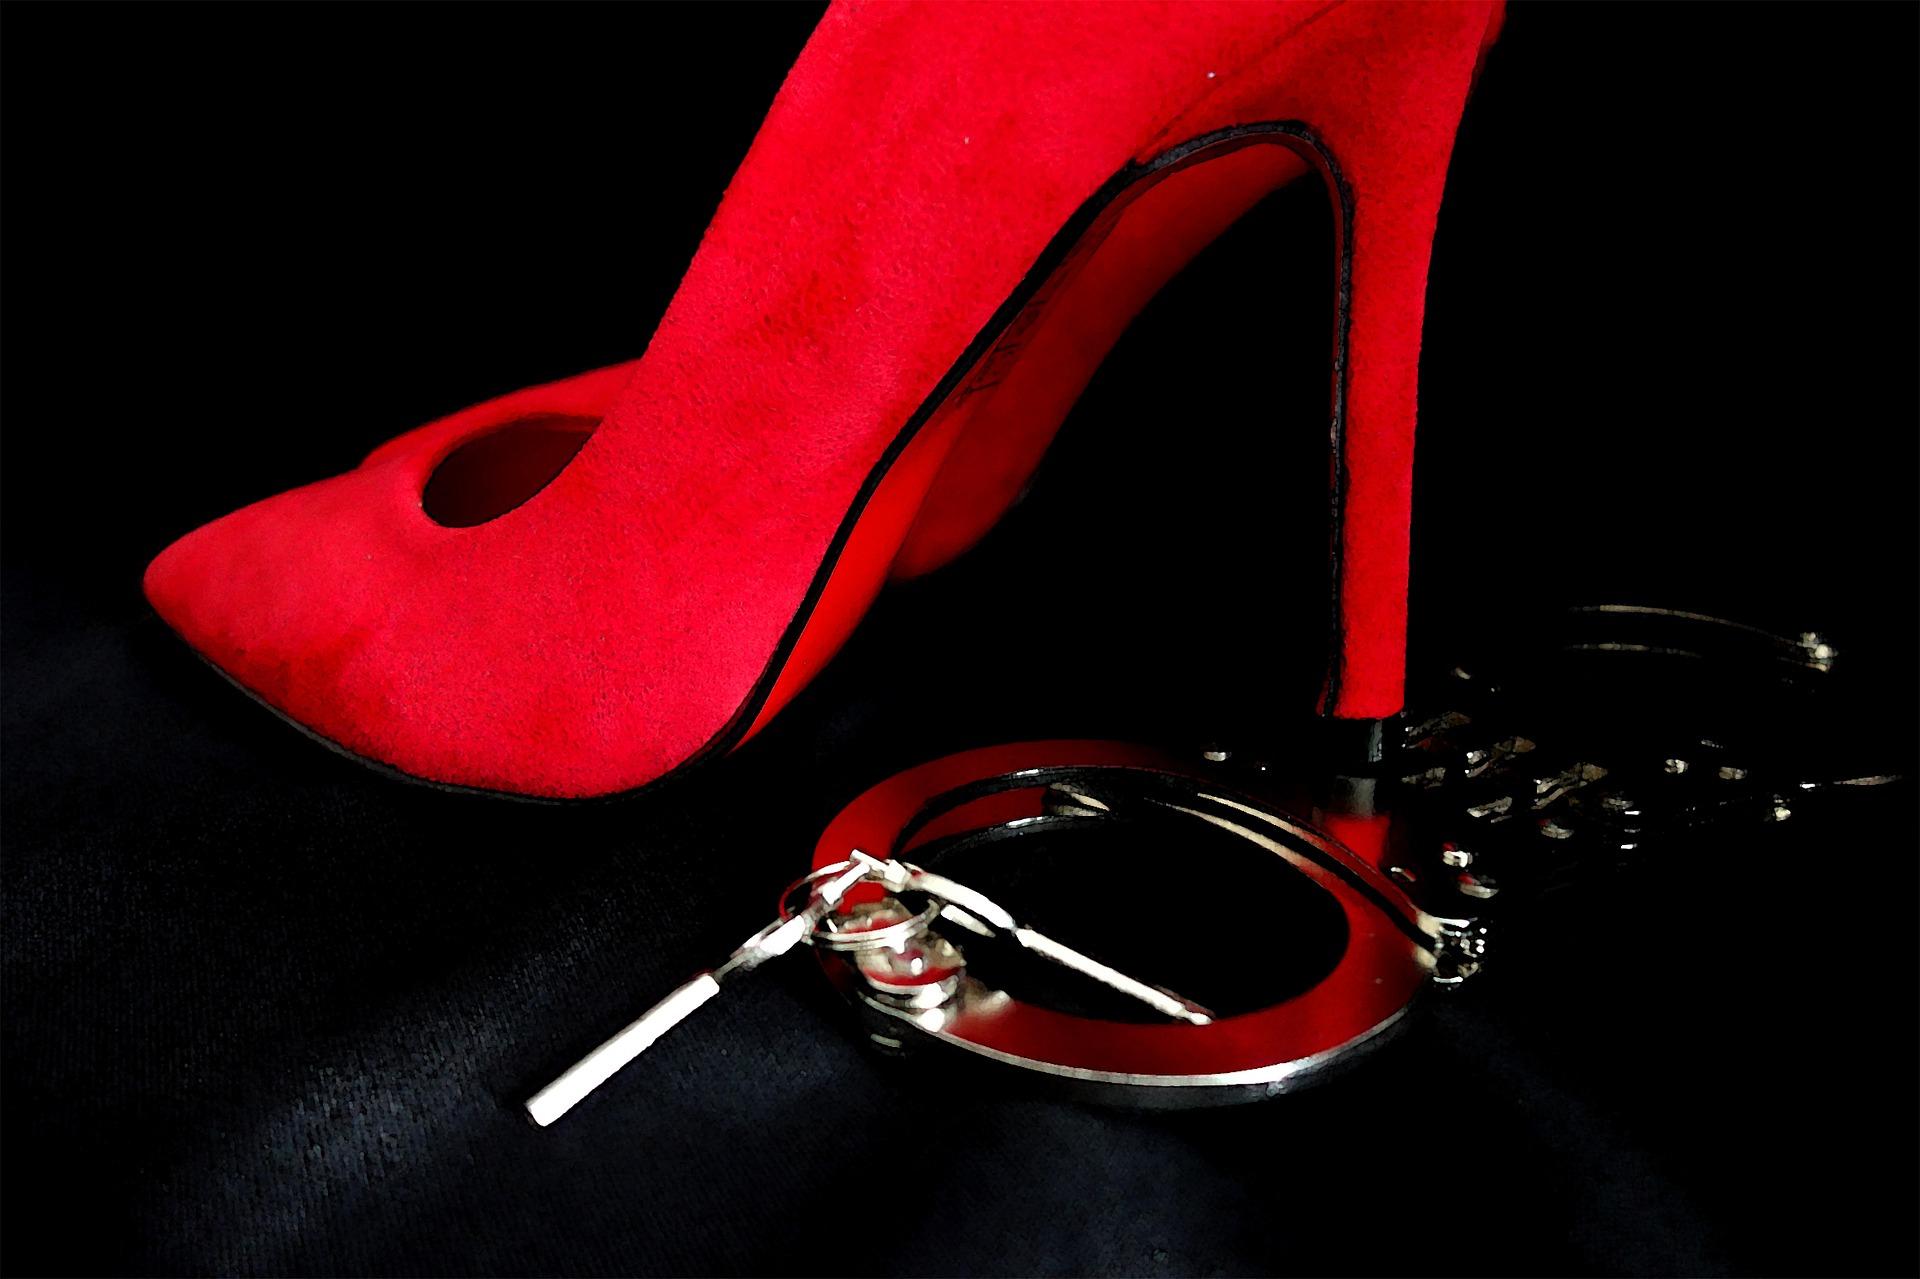 hauts talons-menottes-domination-femmes-dominantes